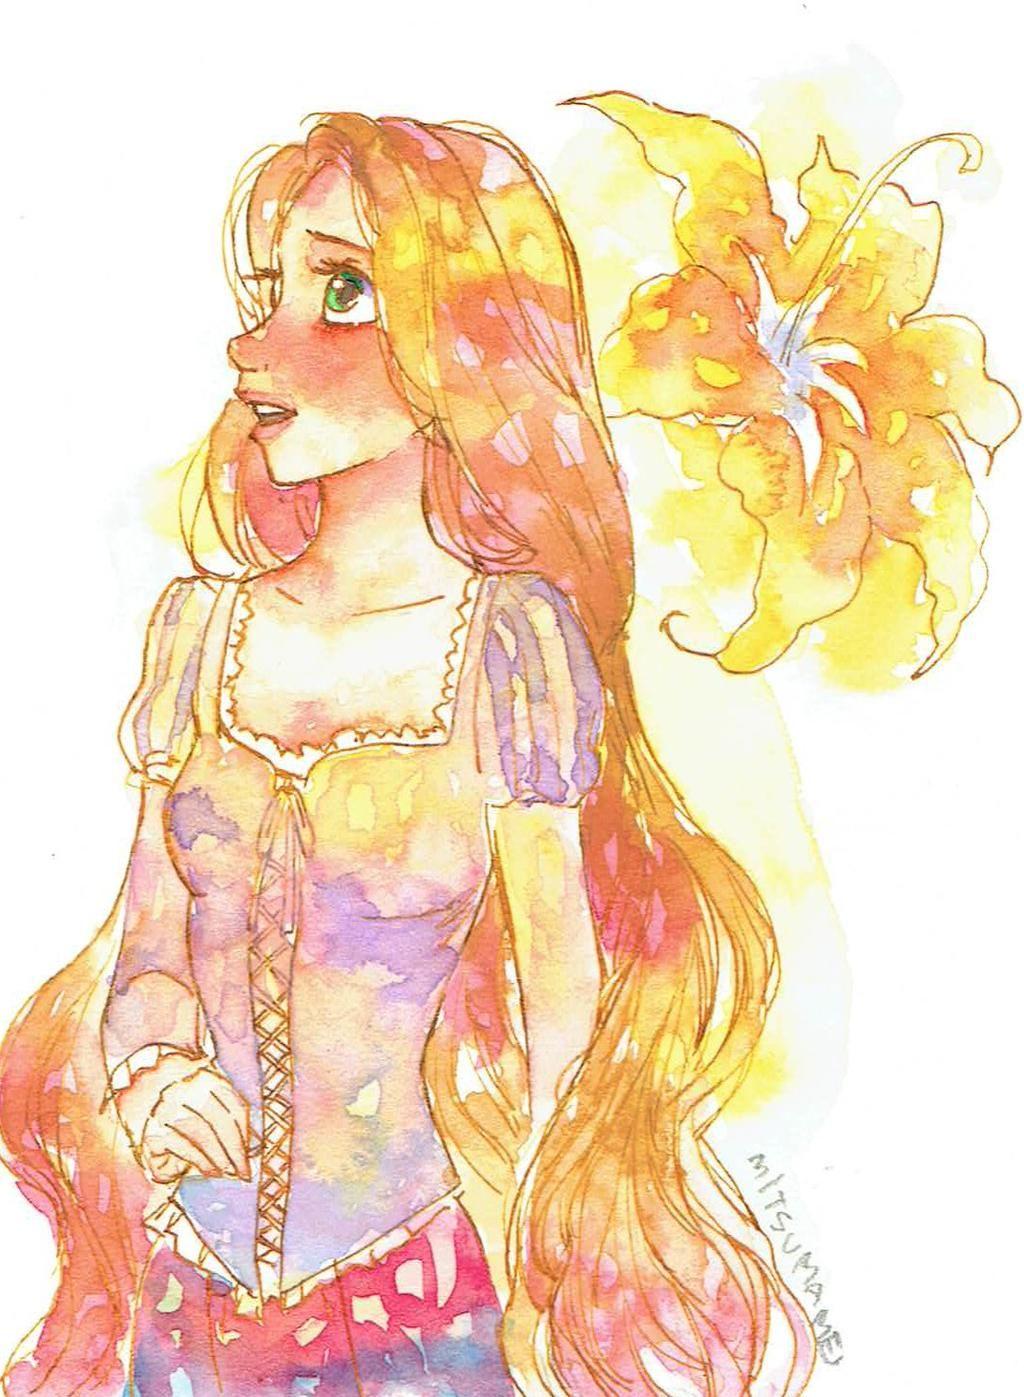 On disney revisit pinterest raiponce disney et - Reponse dessin anime ...